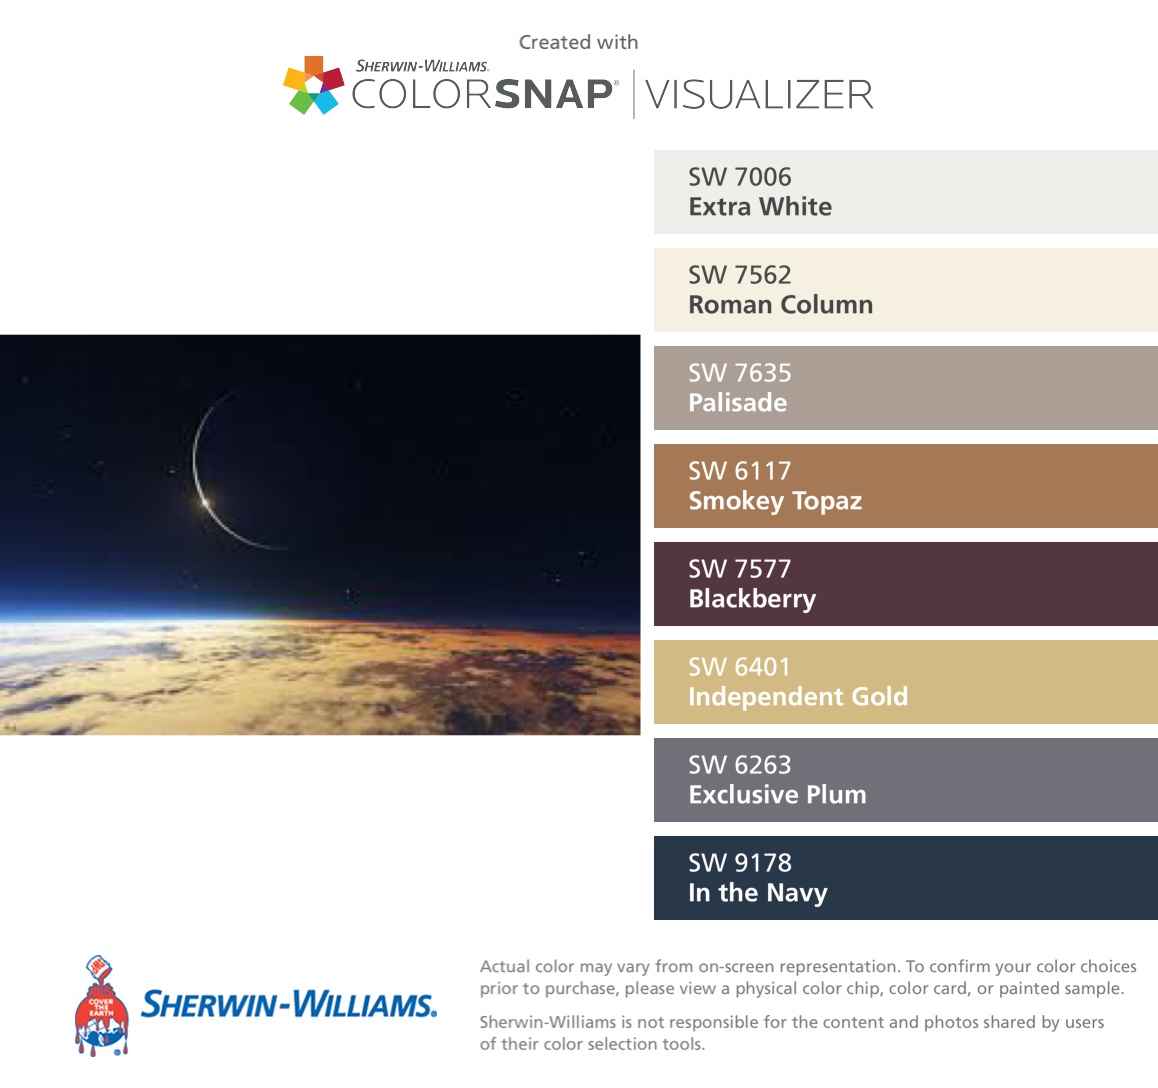 Solar Eclipse Sherwin-Williams: Extra White (SW 7006